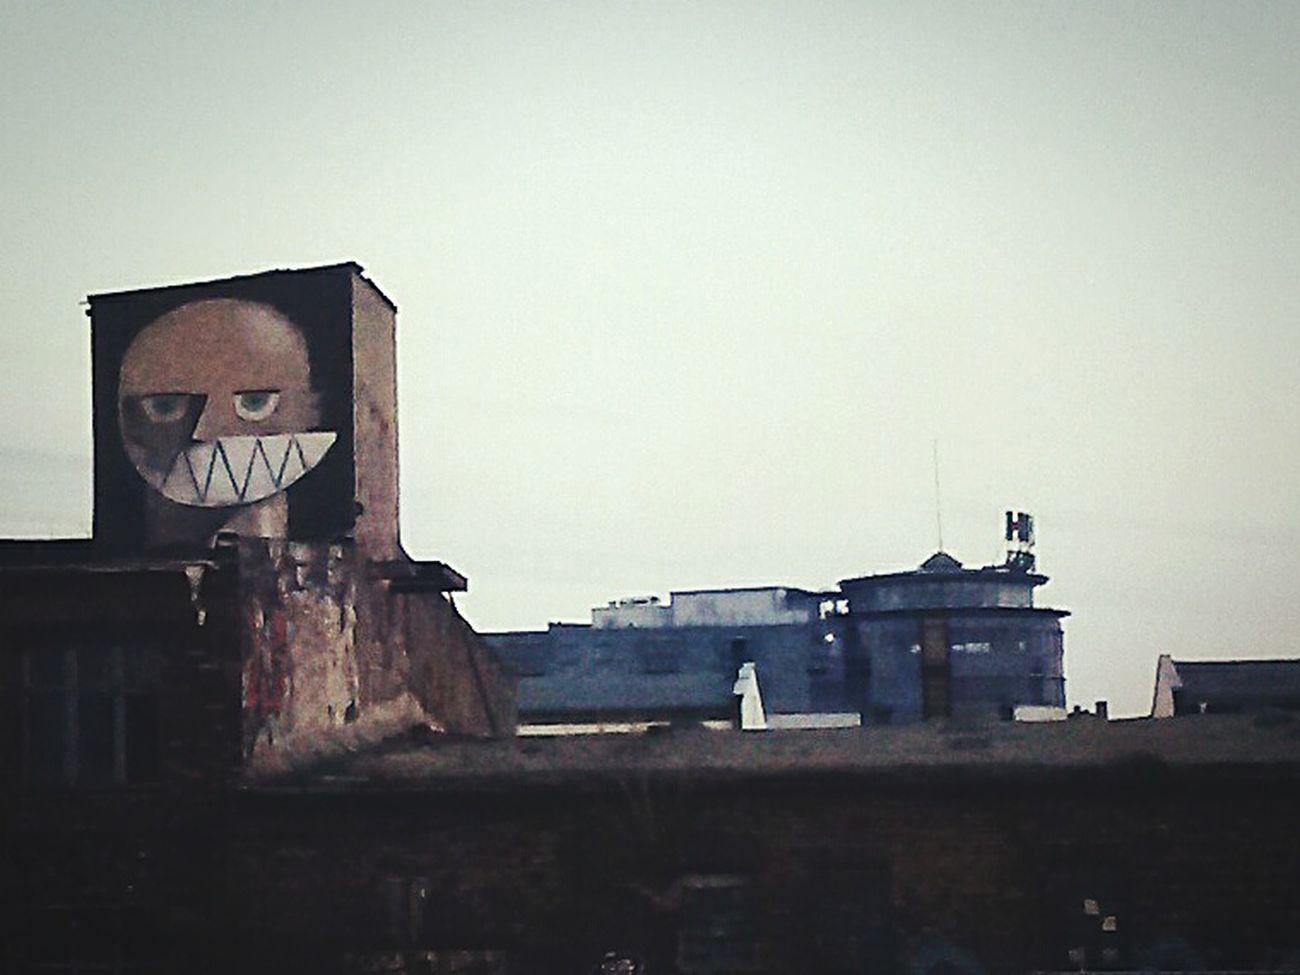 Streetartleipzig Streetart Mural Houses Graffiti Graffiti Art Leipzig